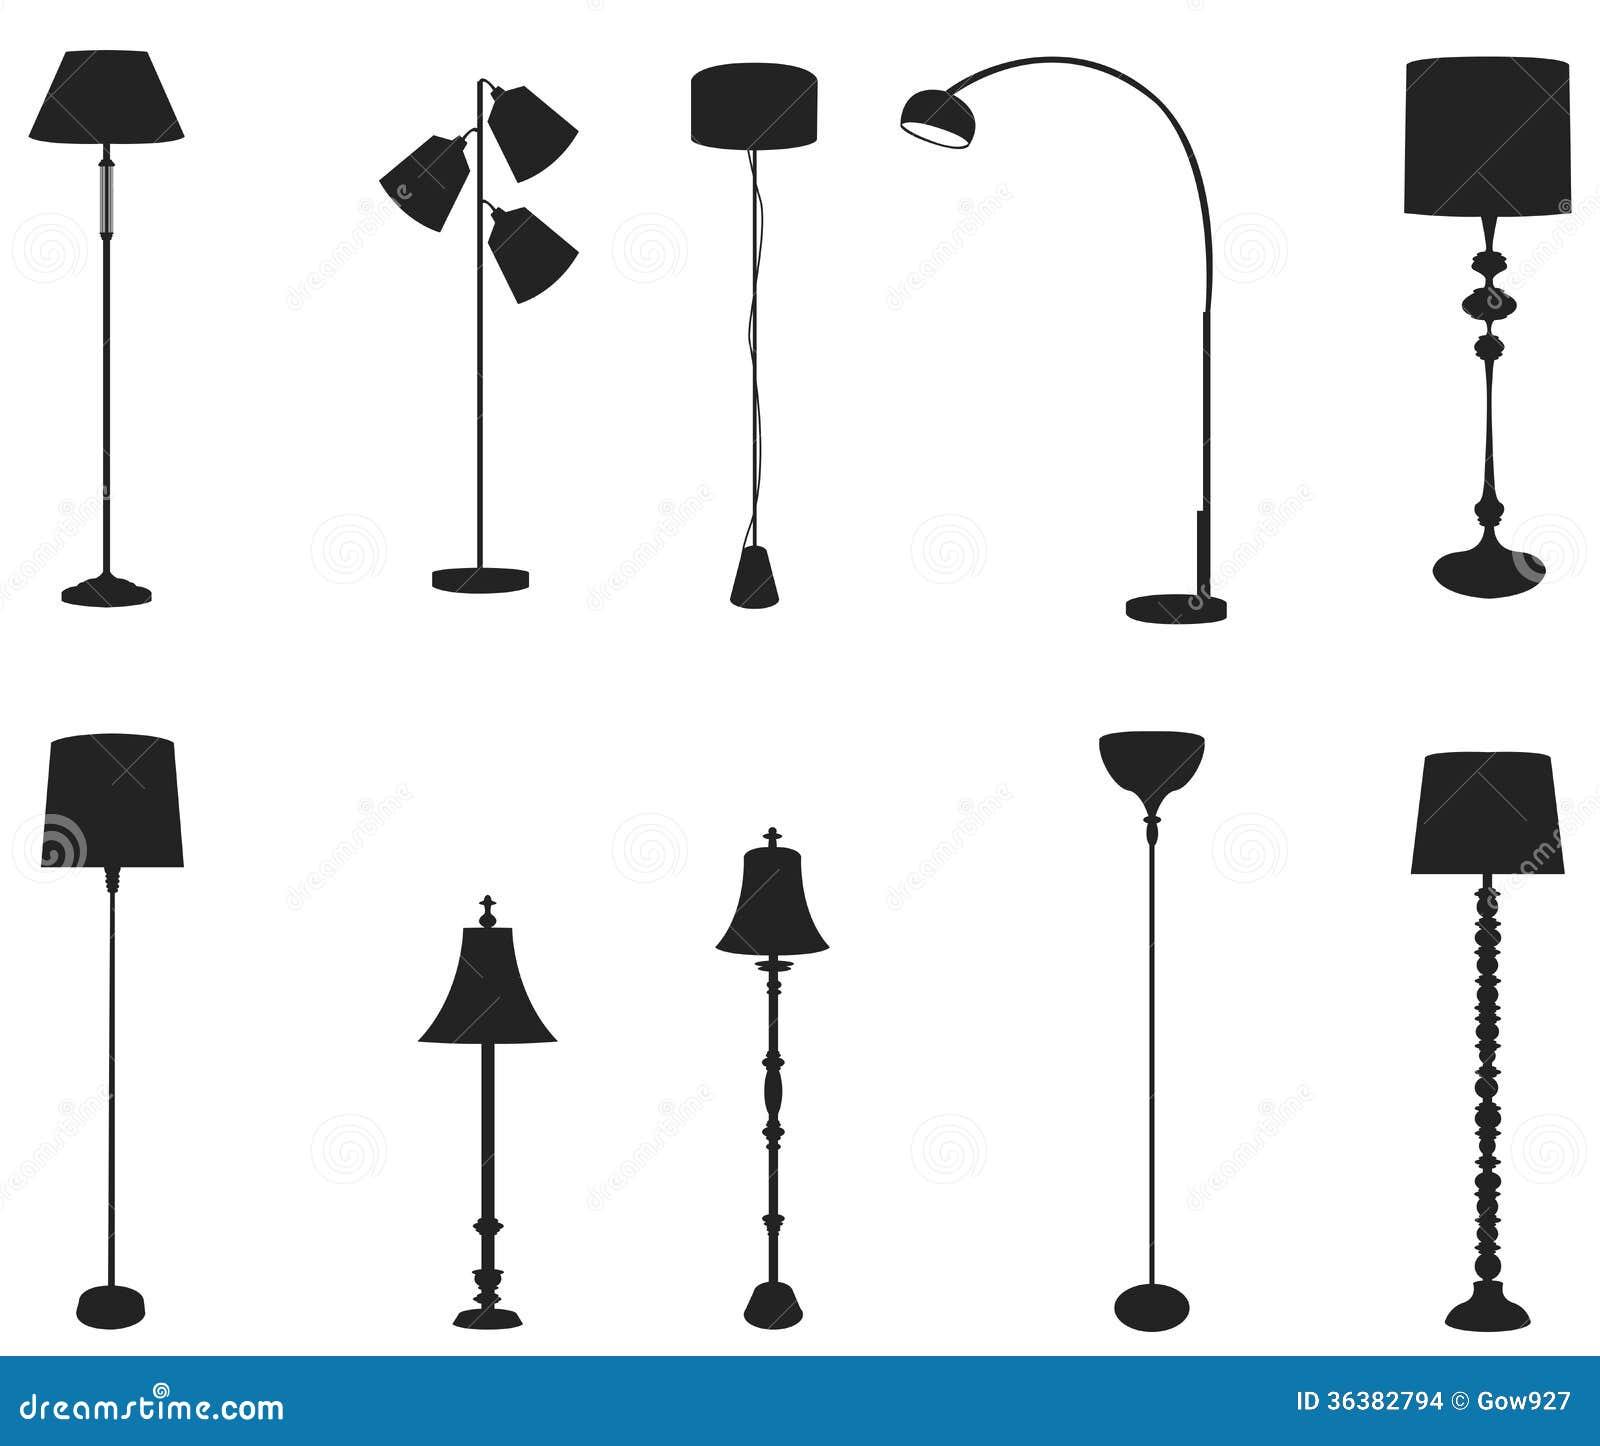 Create 3d Floor Plan Sets Of Silhouette Floor Lamps Create By Vector Stock